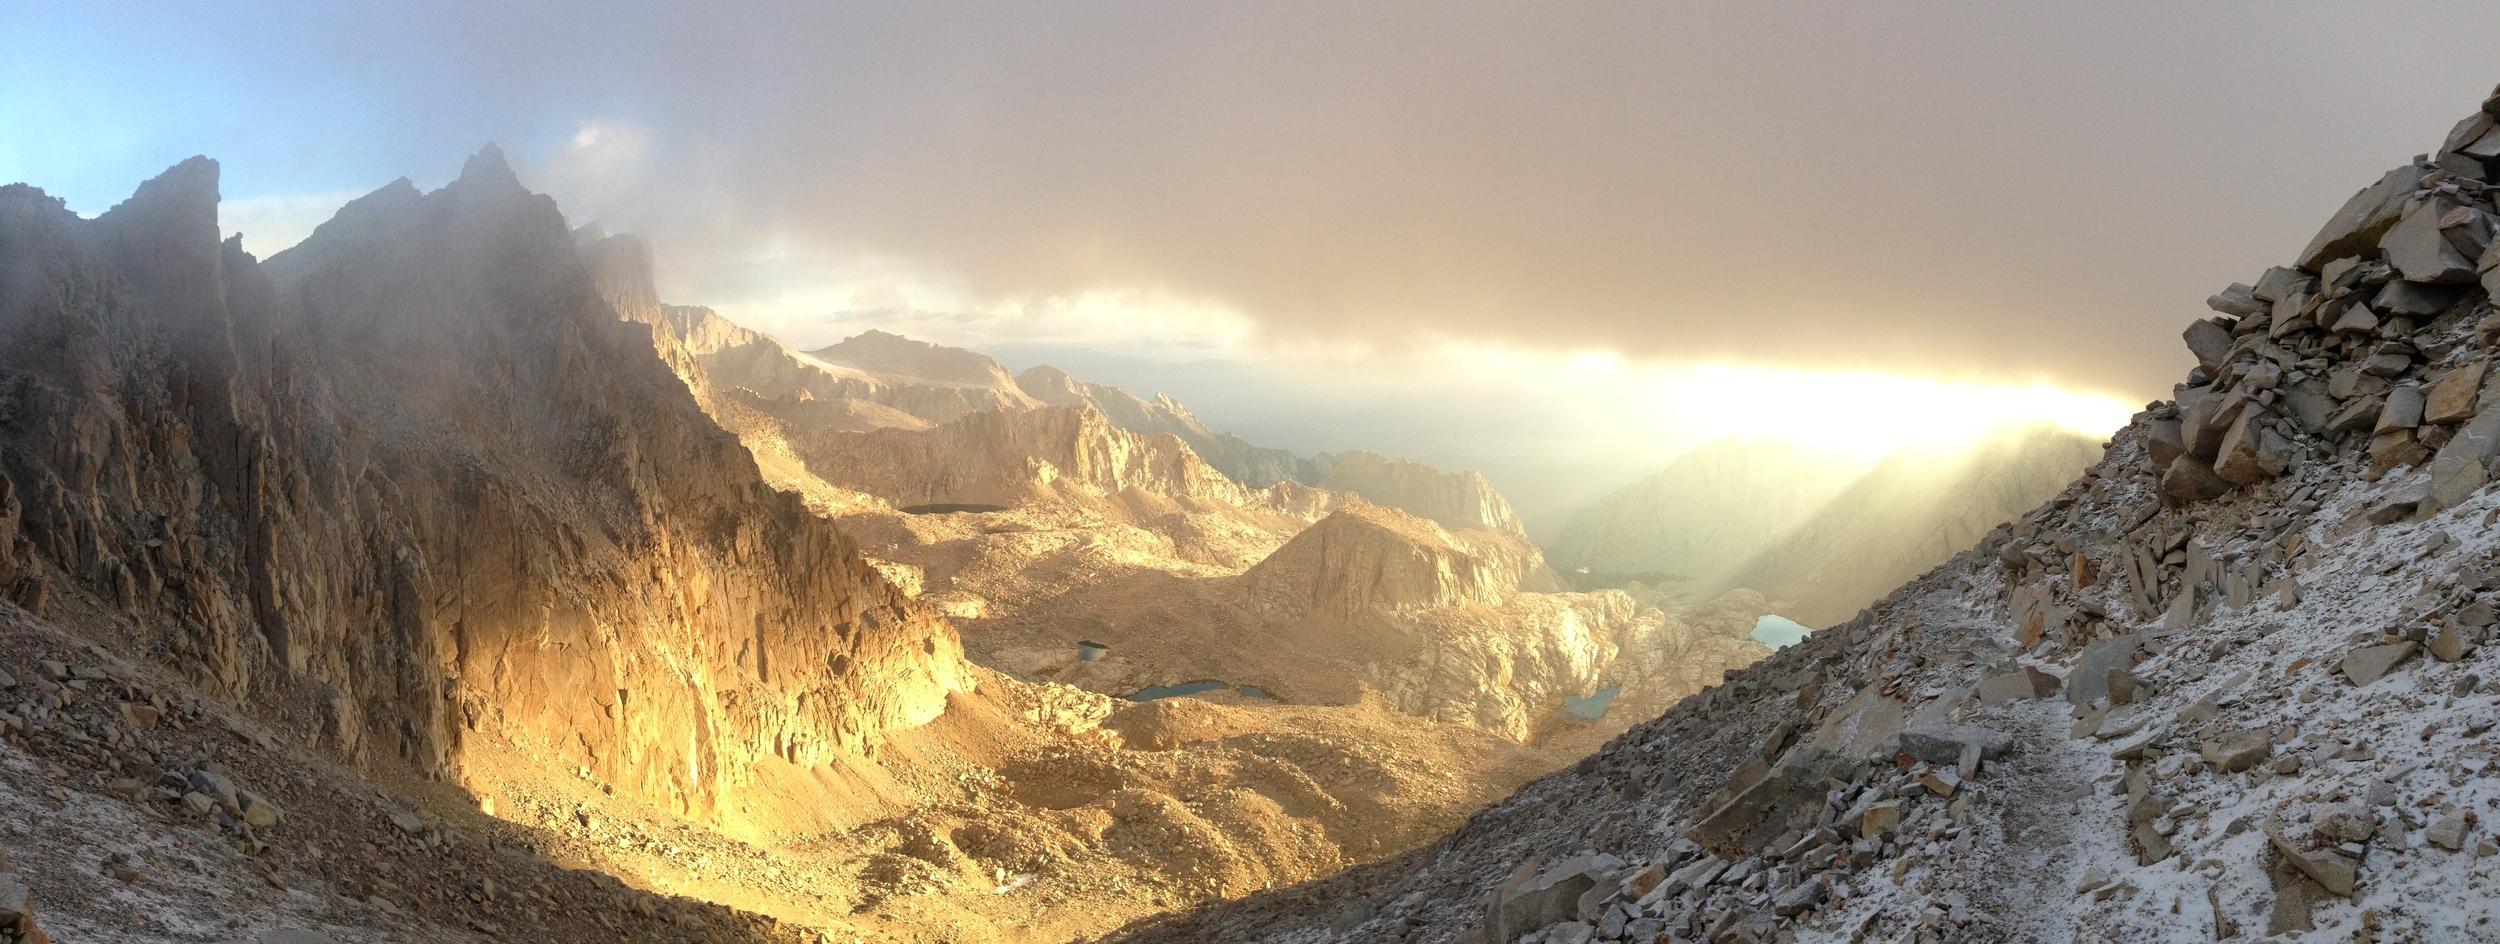 Mount Whitney Trail, Dawn, September 21, 2014